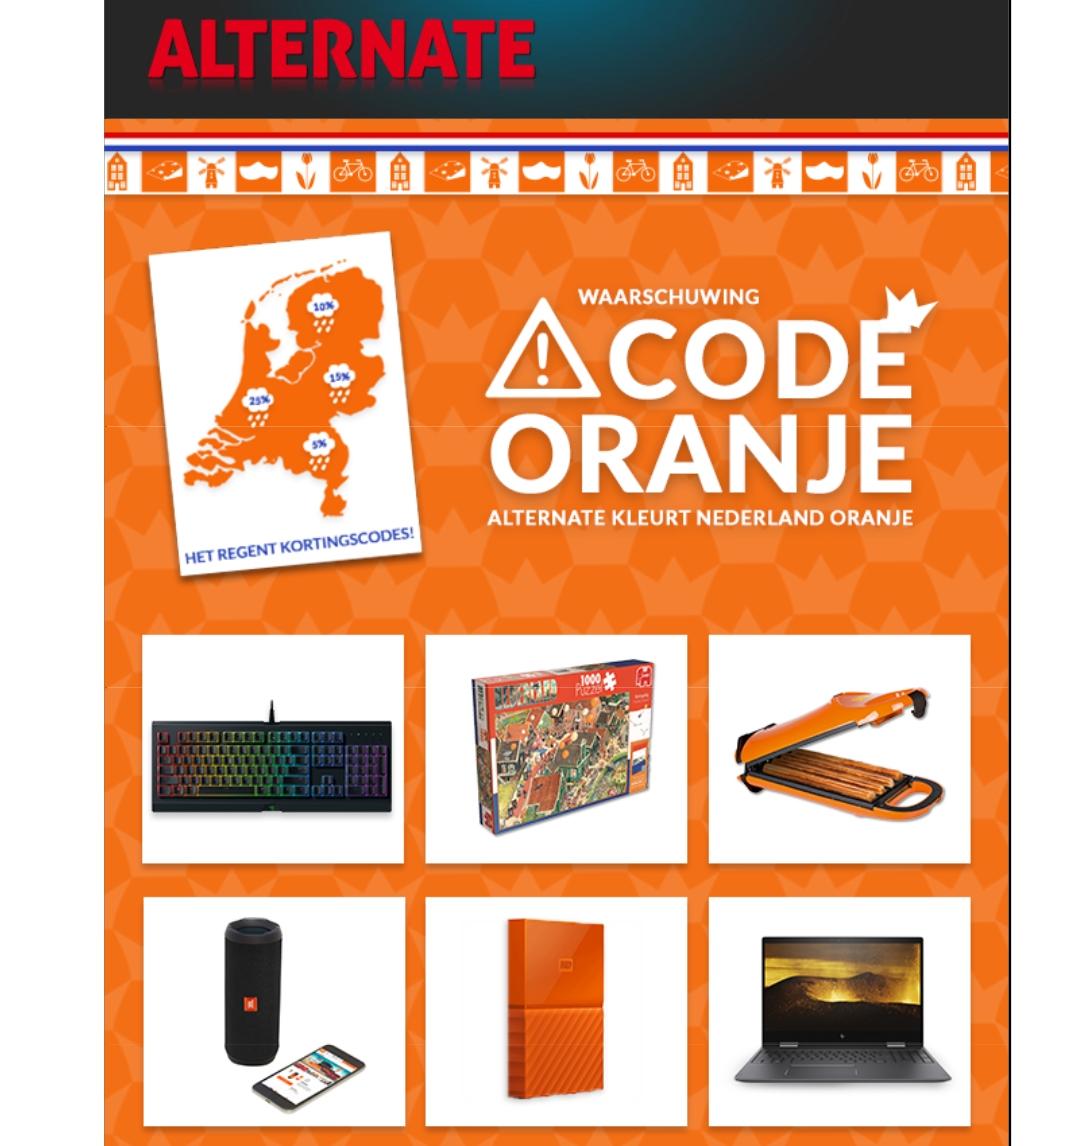 Code Oranje aanbiedingen @ Alternate